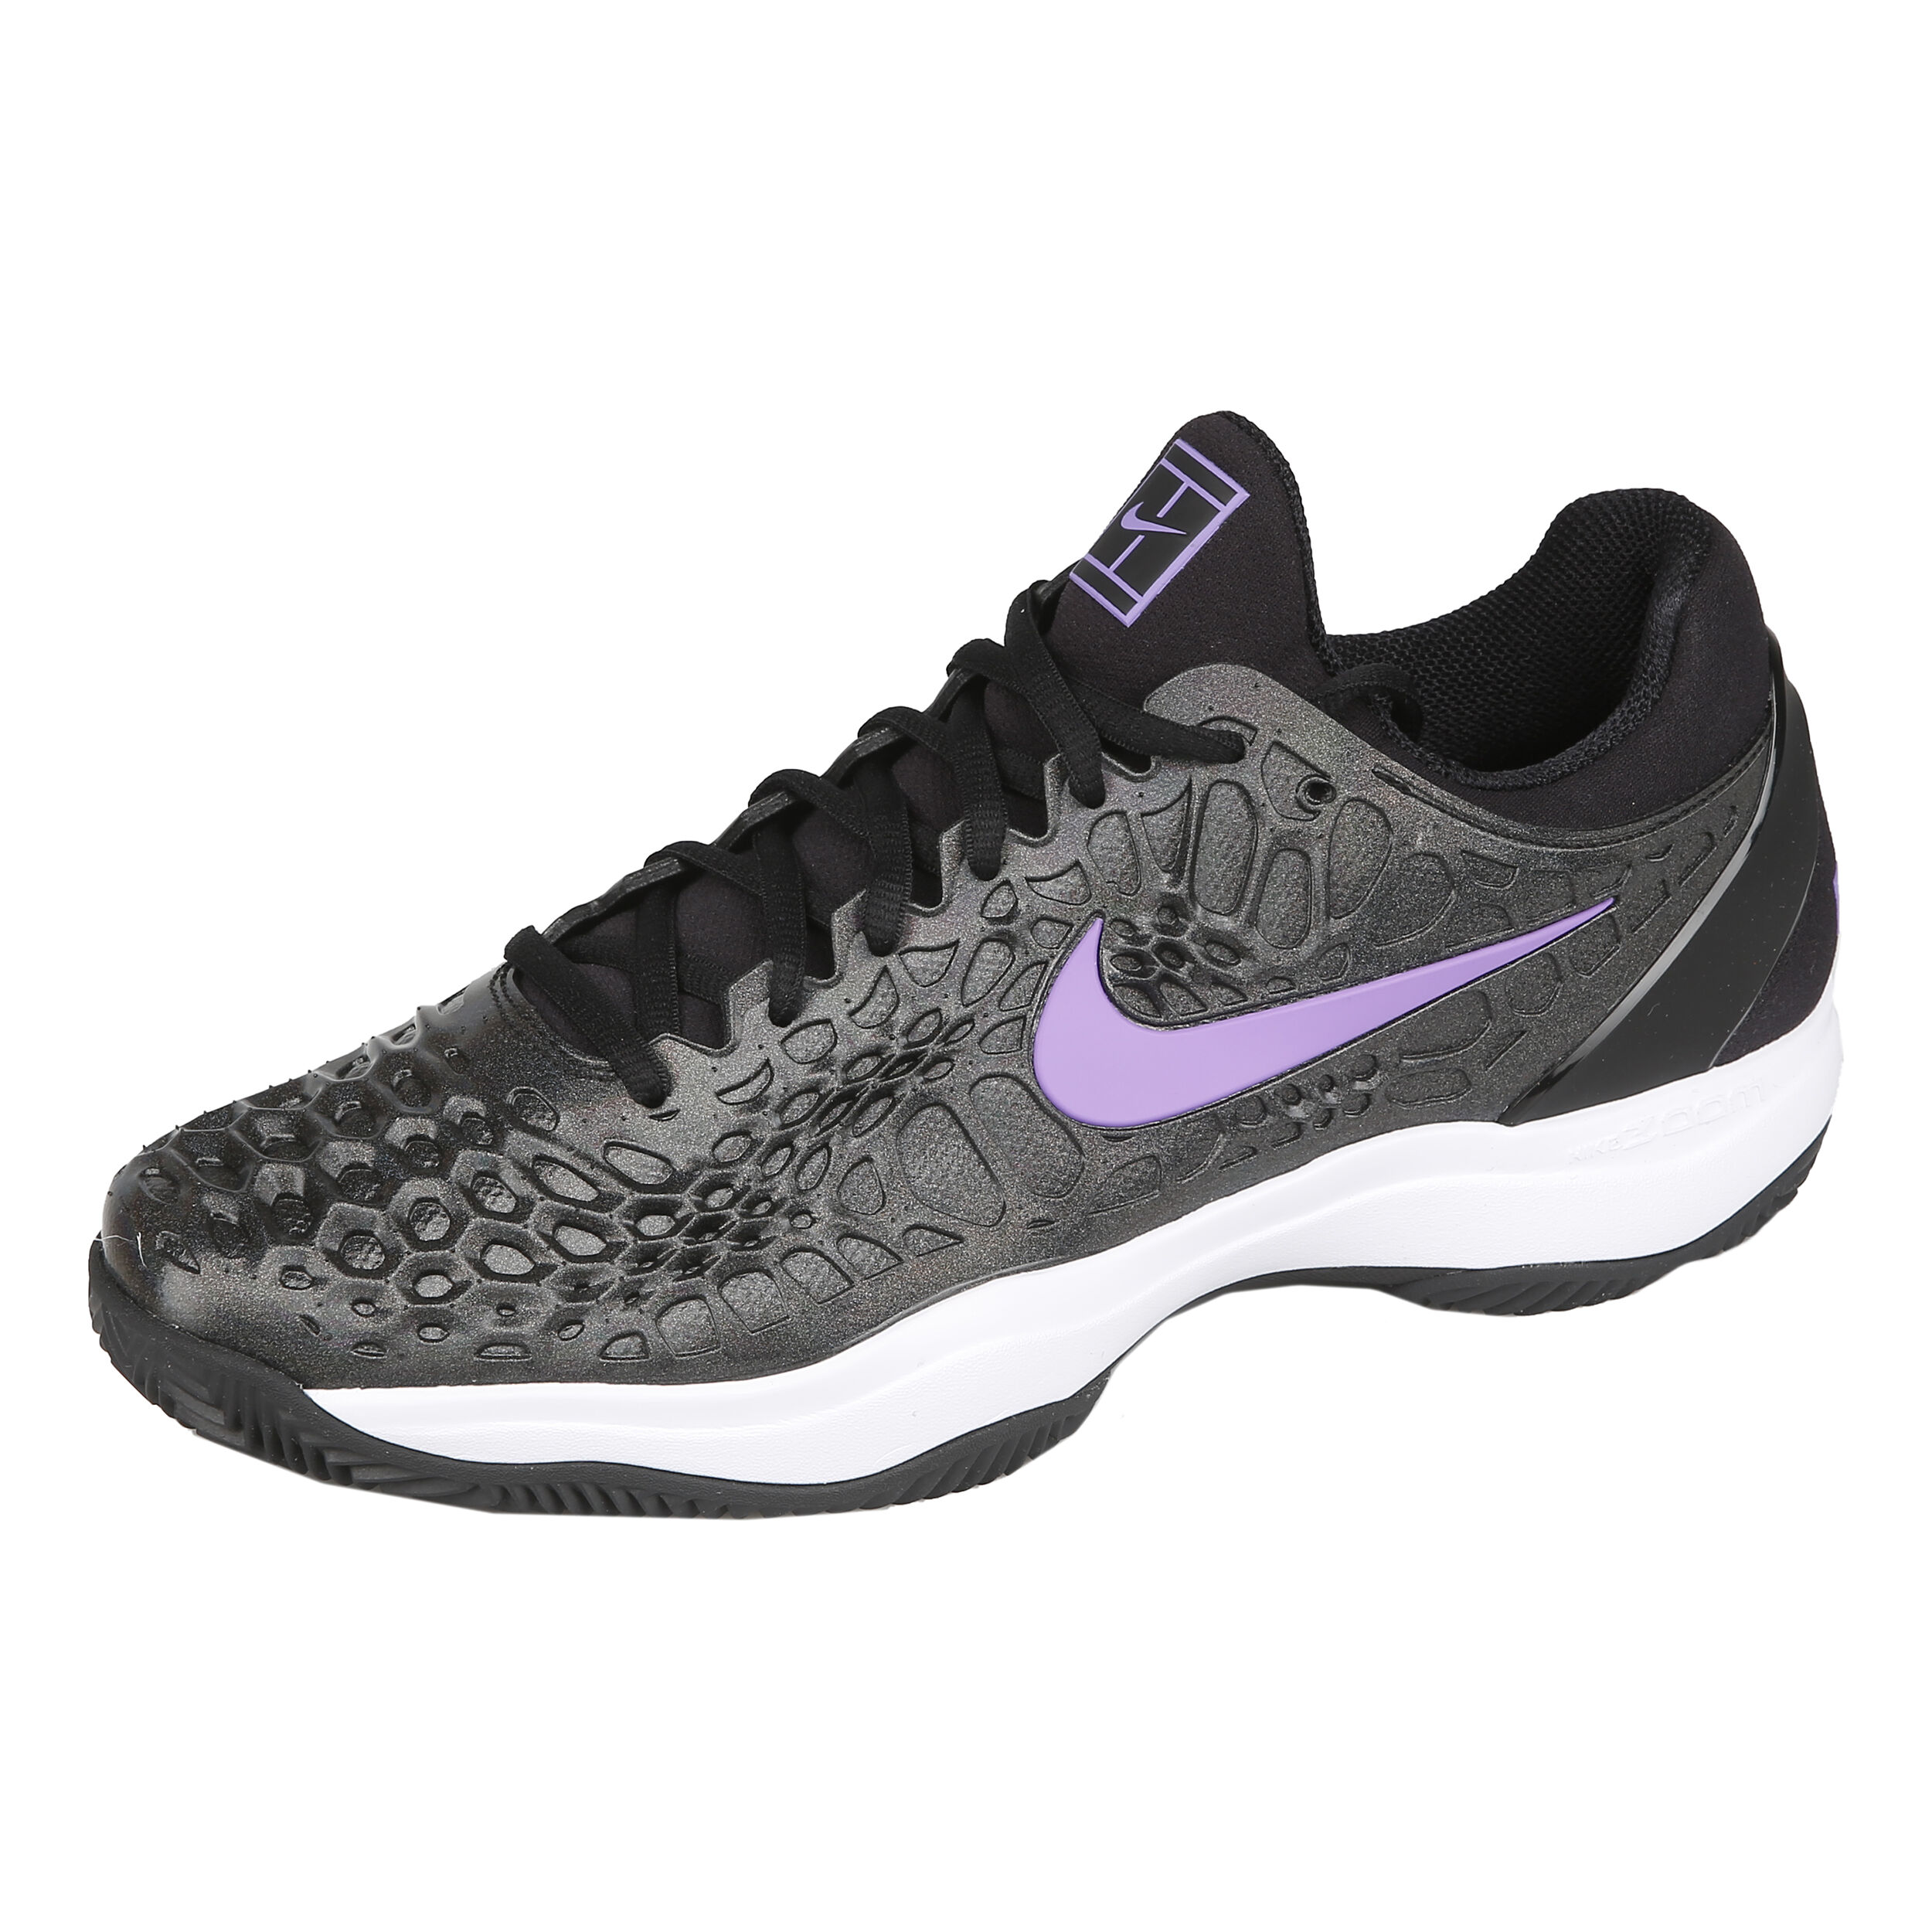 chaussures de tennis nike nadal